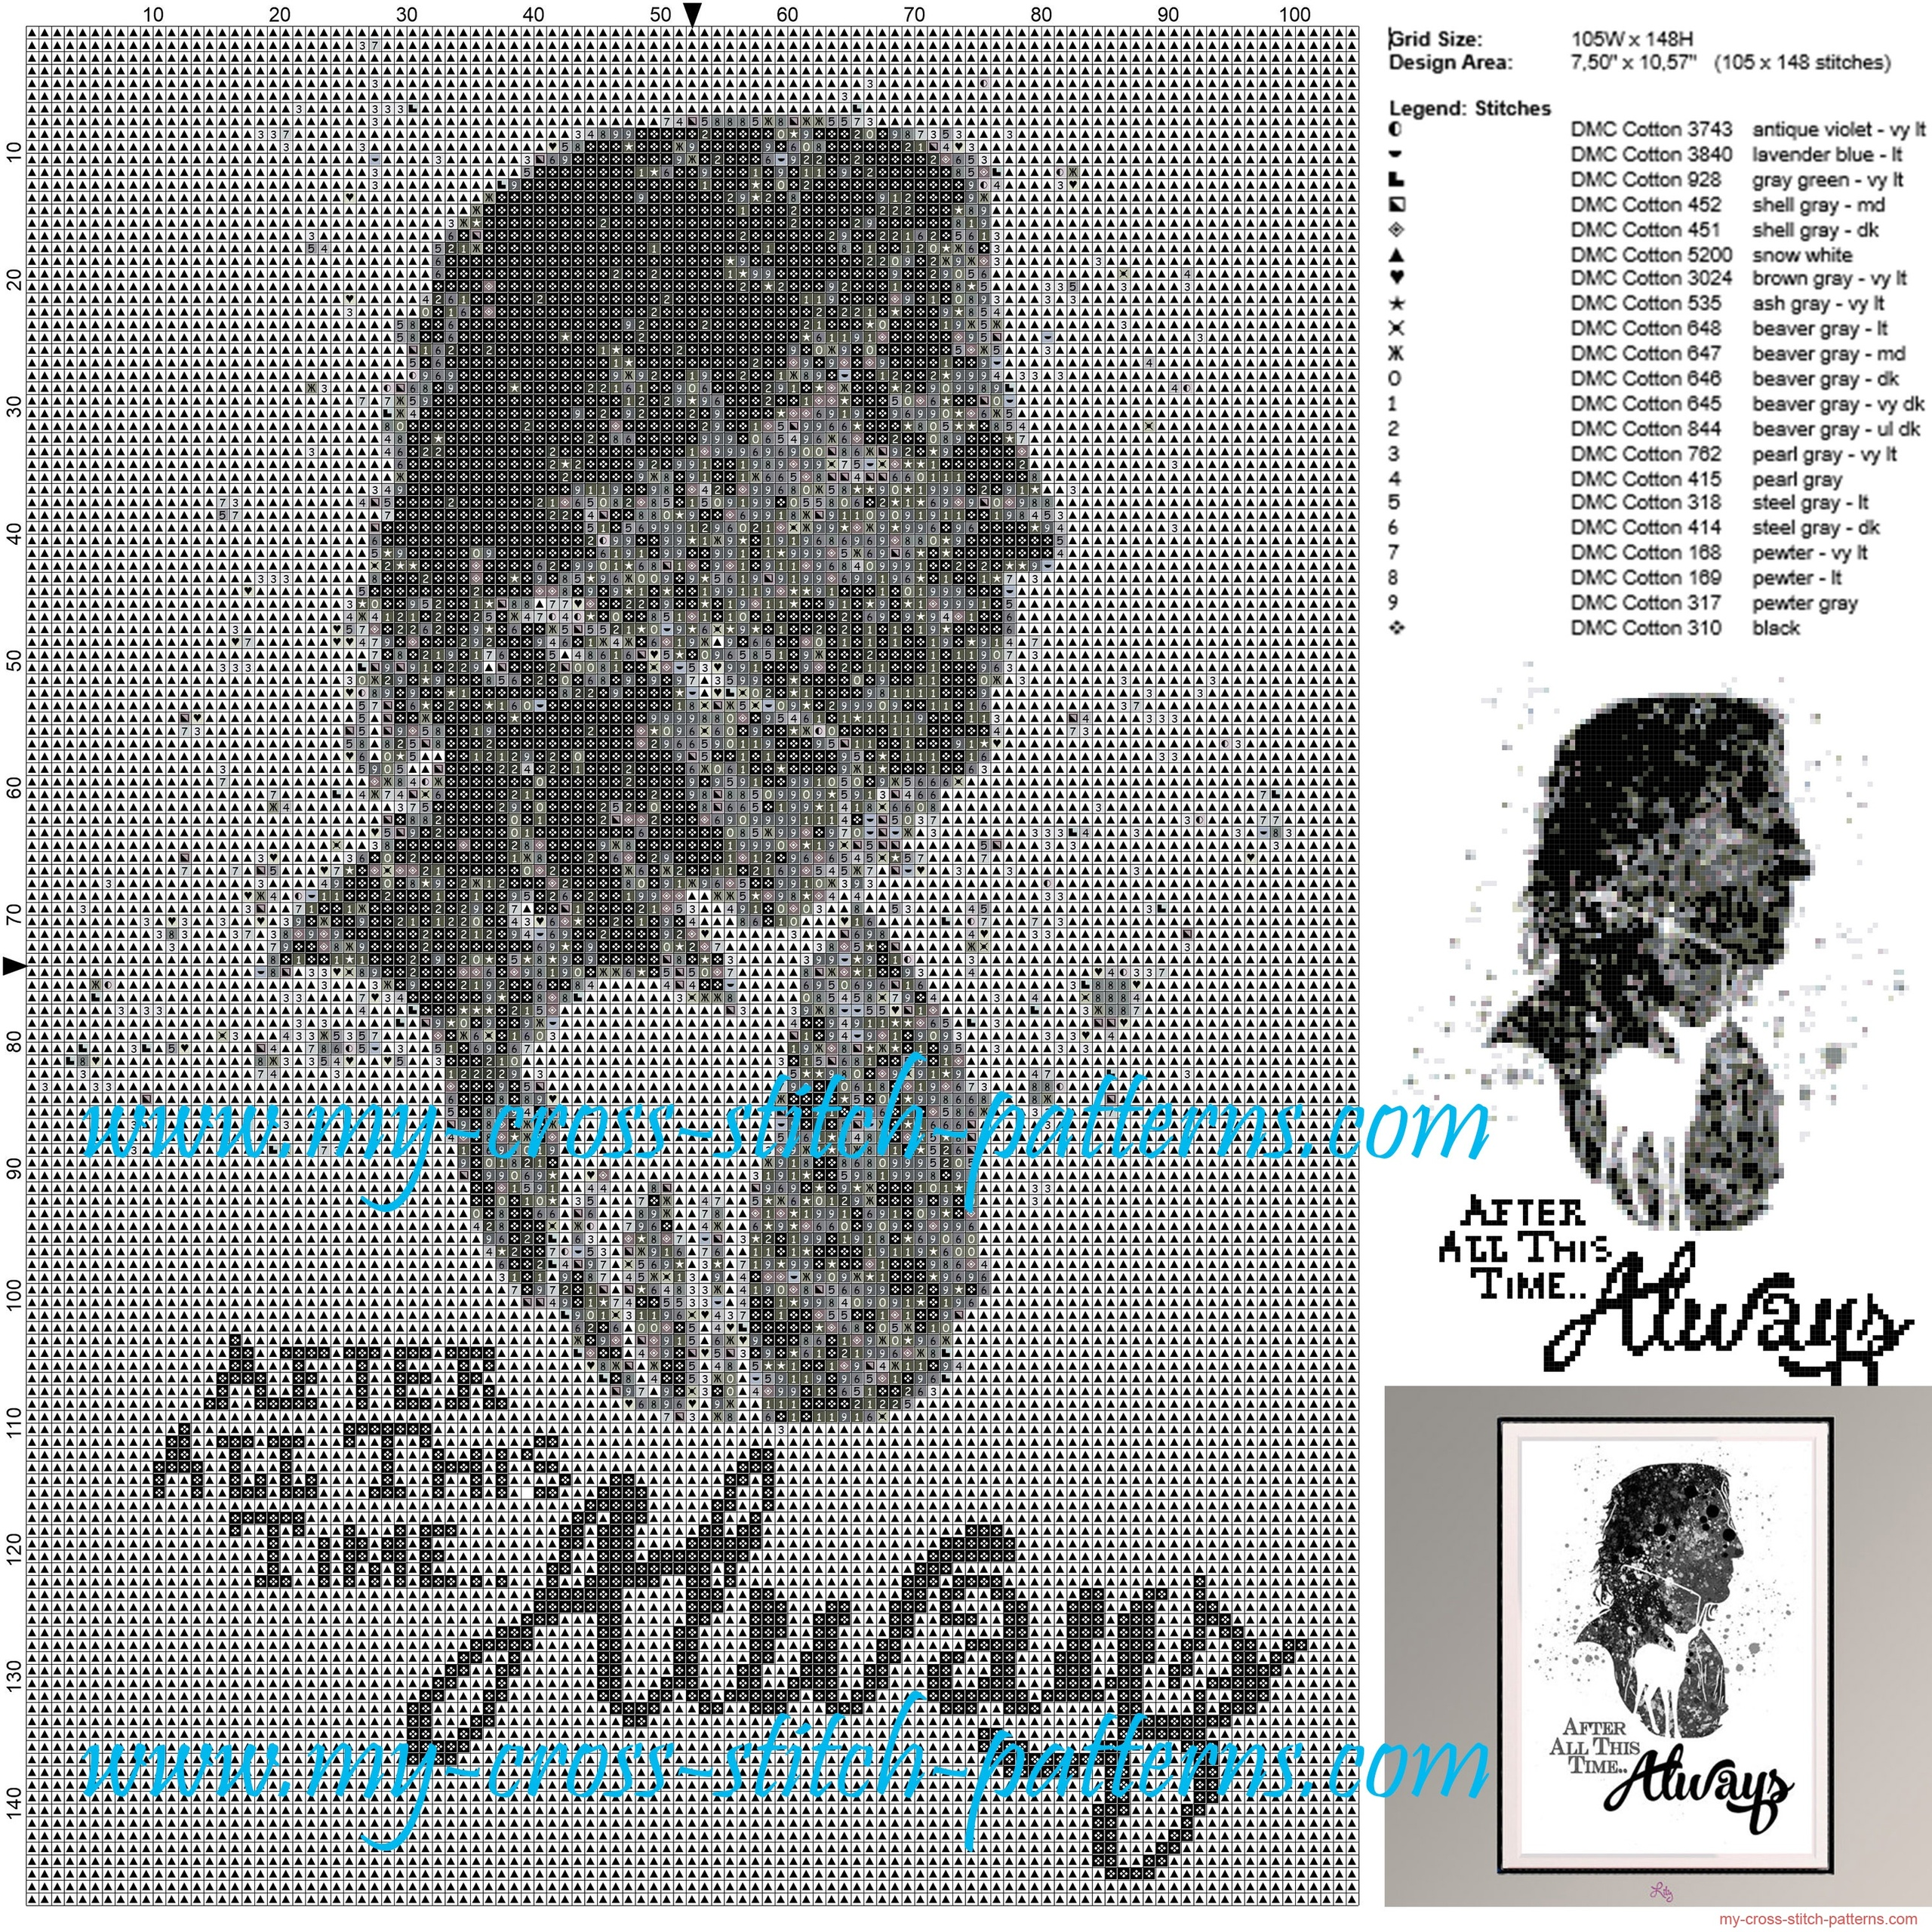 always_harry_potter_cross_stitch_pattern_